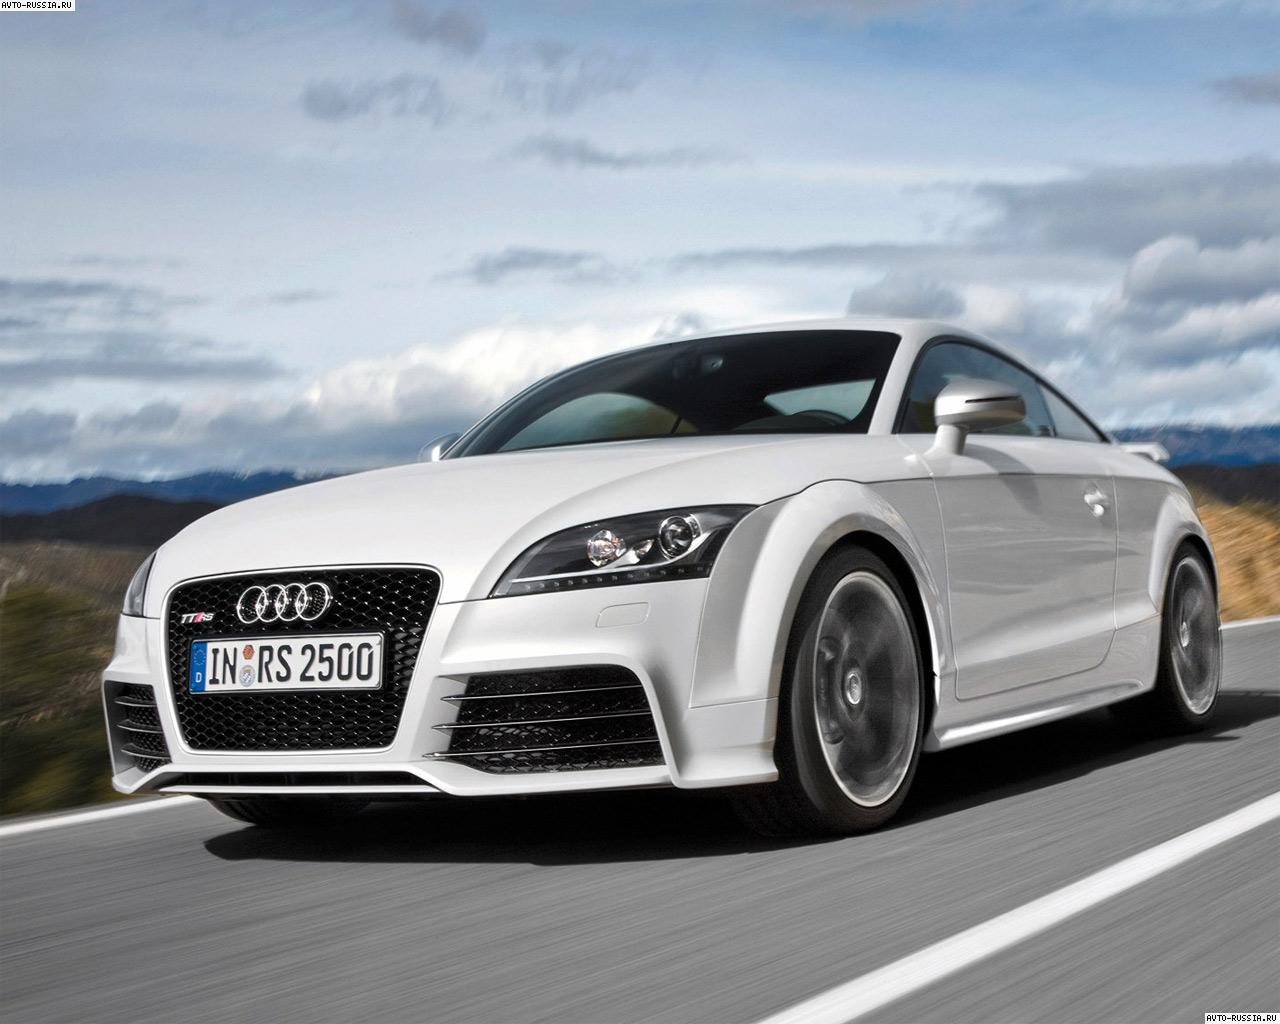 Audi TT RS Wallpapers HD Download 1280x1024